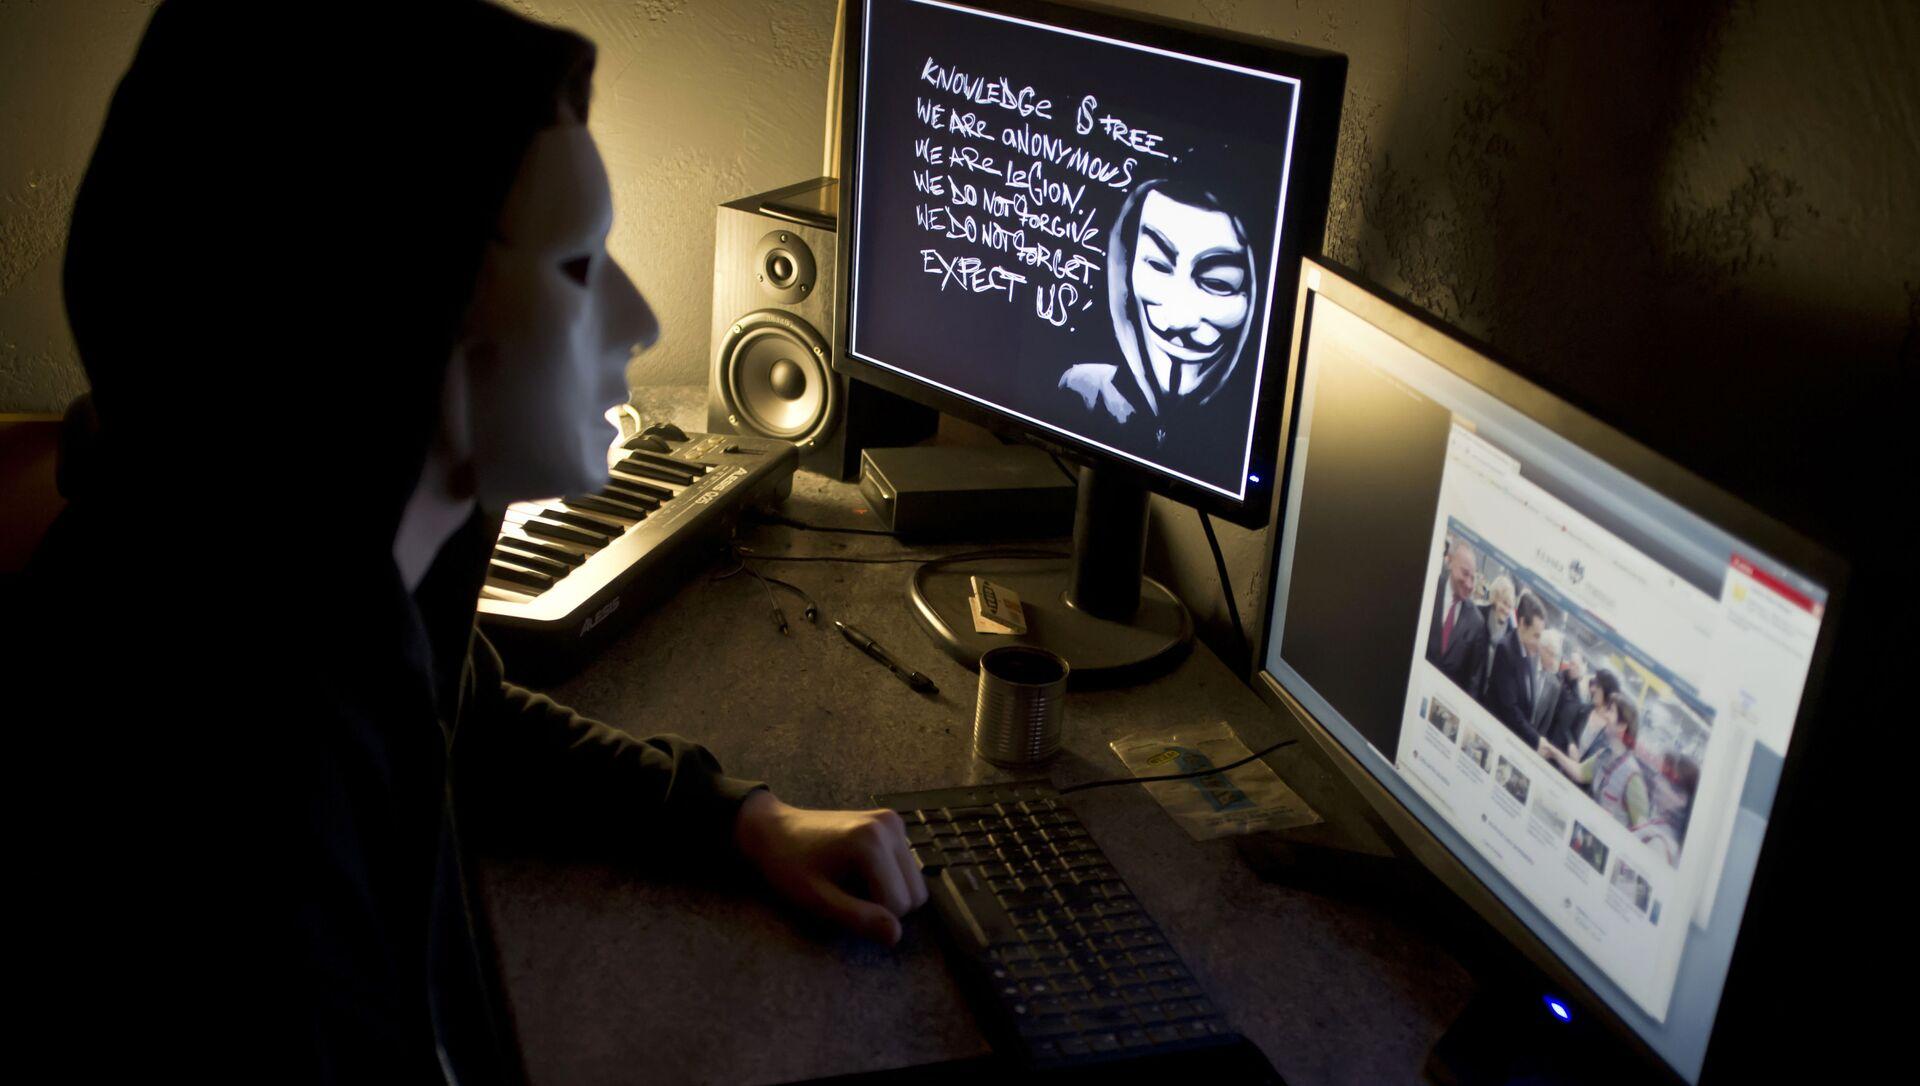 Хакер из Anonymous перед экраном компьютера - Sputnik Азербайджан, 1920, 08.08.2021